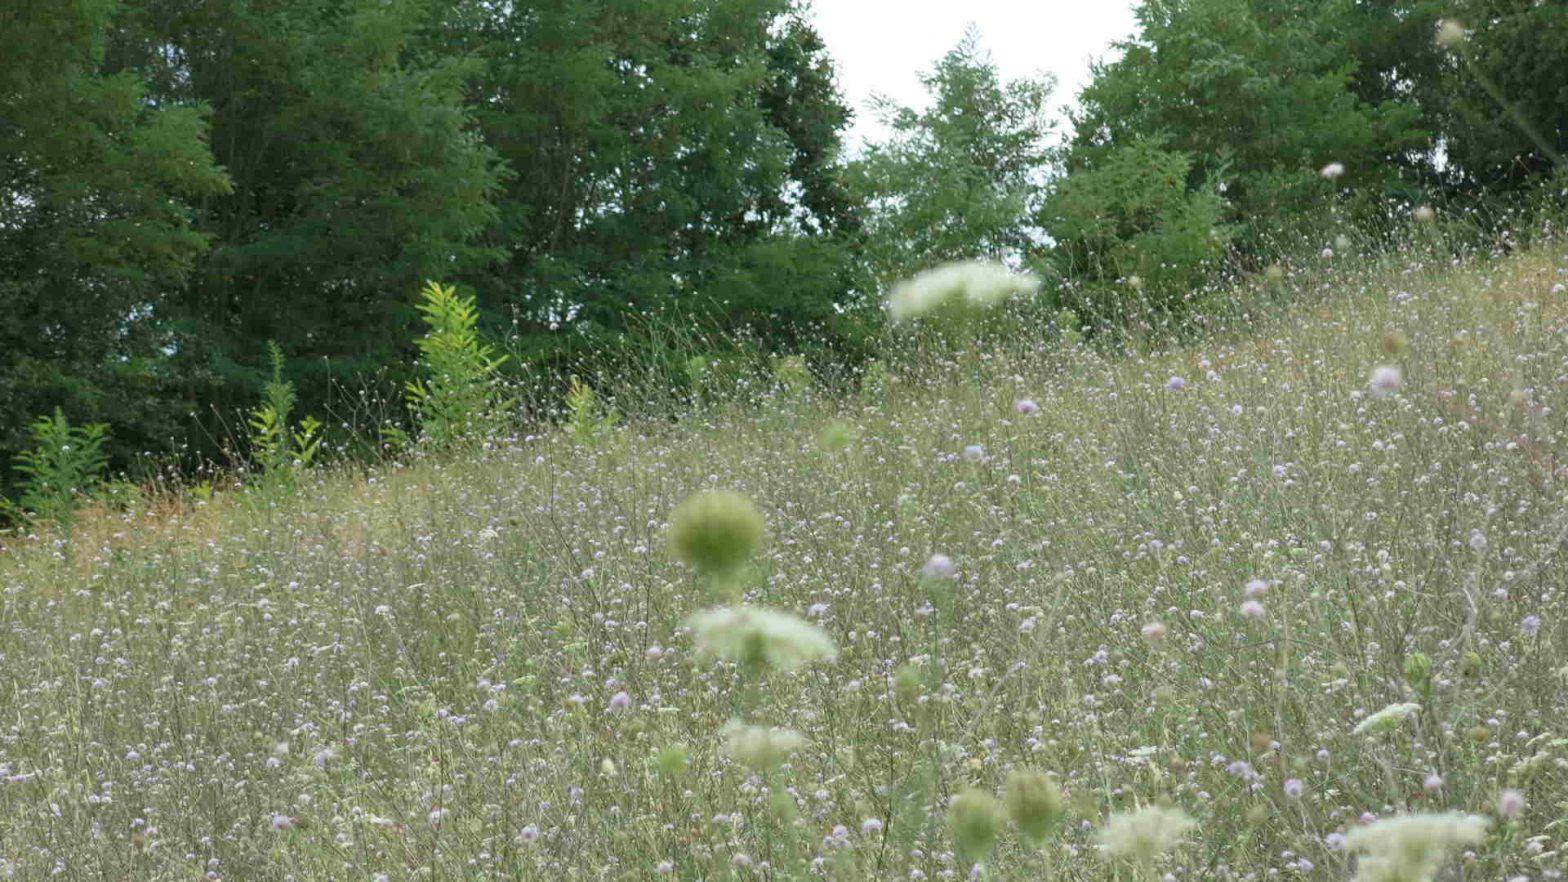 Habitat for bees